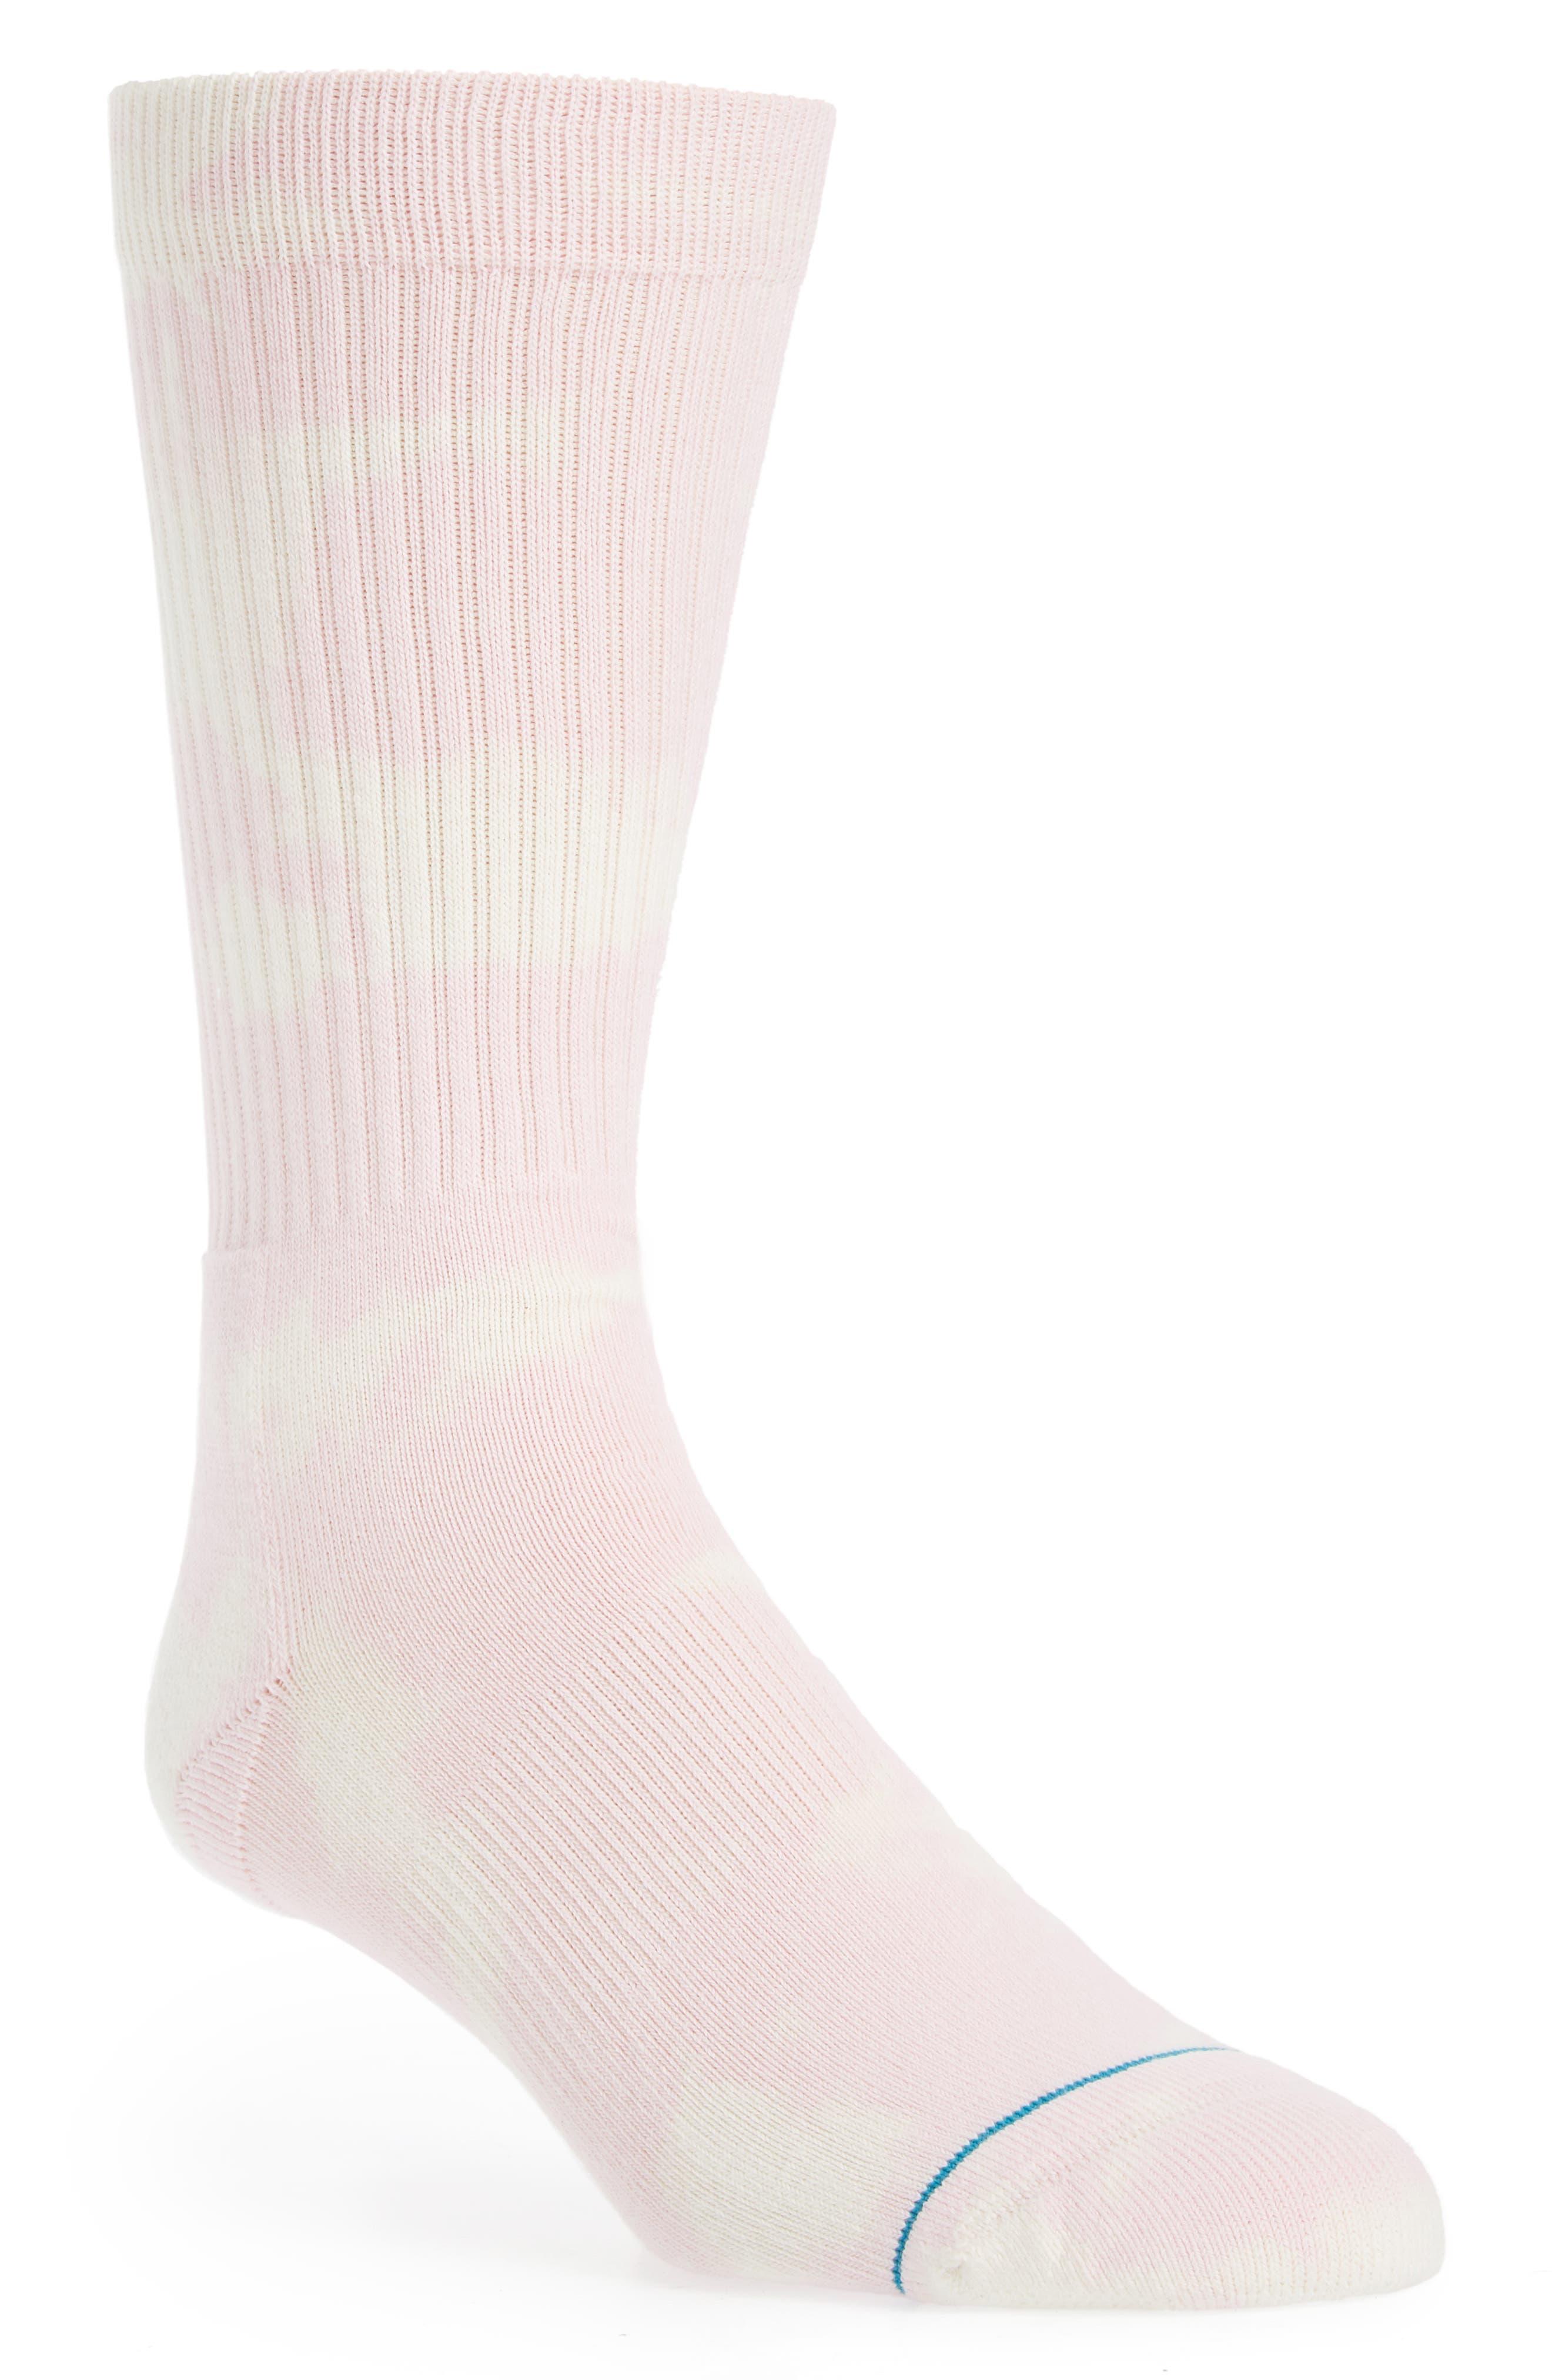 Stance Russell Crew Socks